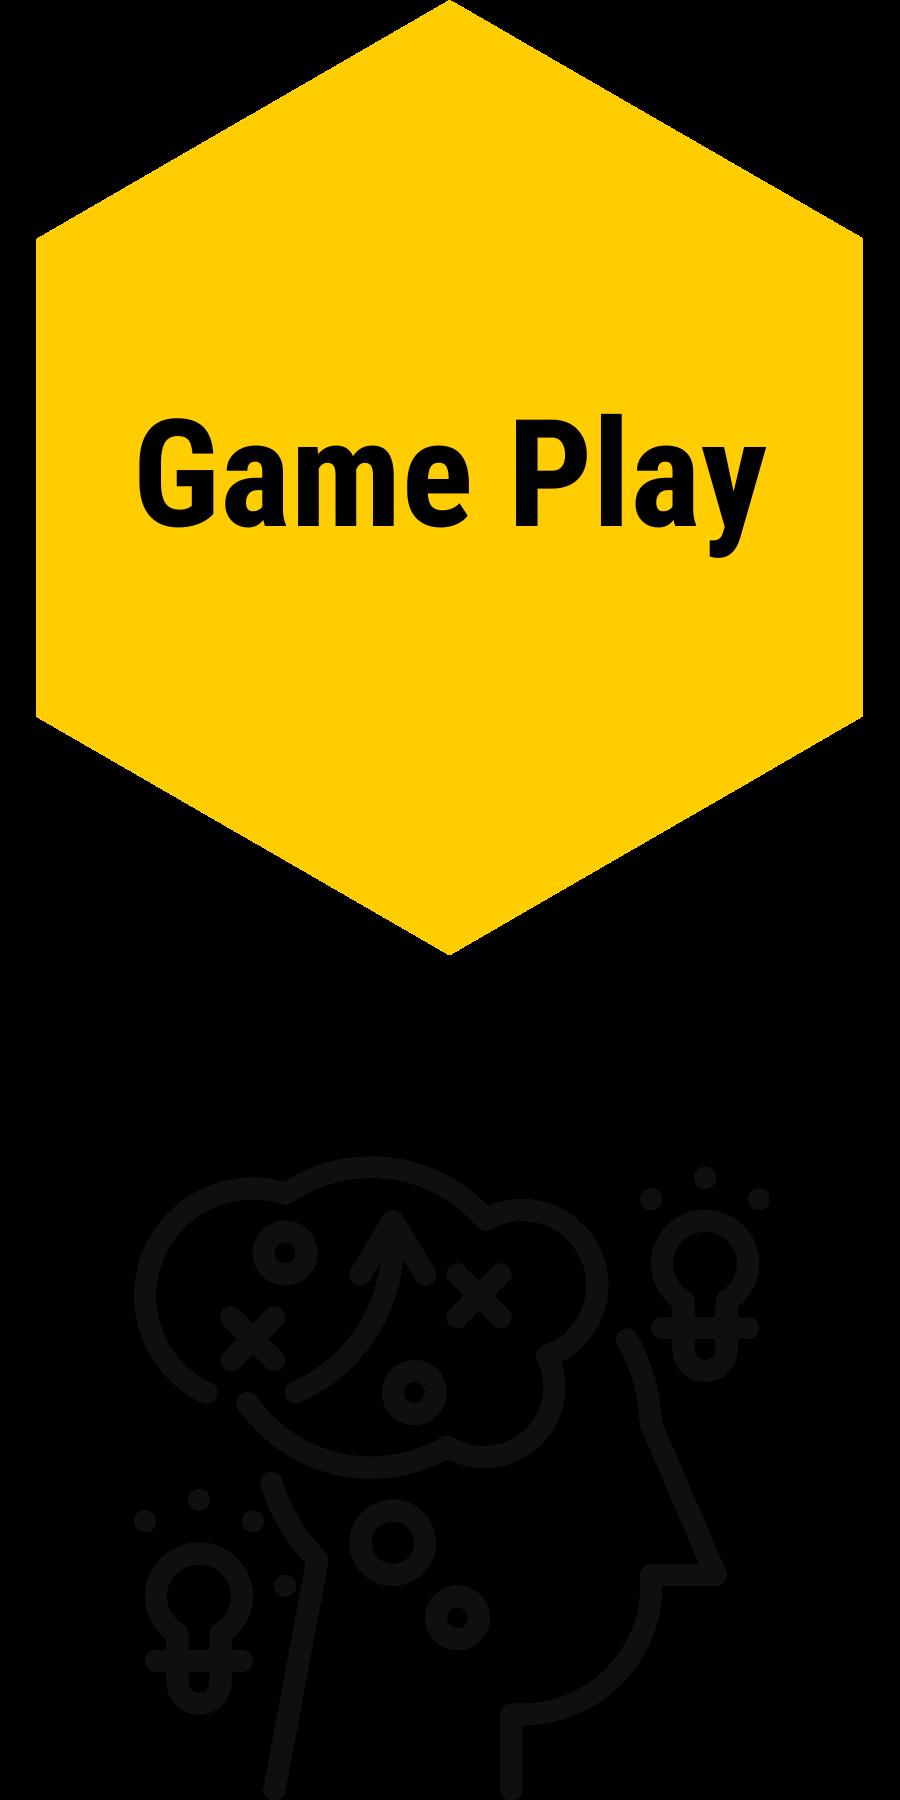 Use Onthejob Game Play to Transform Organizational Training